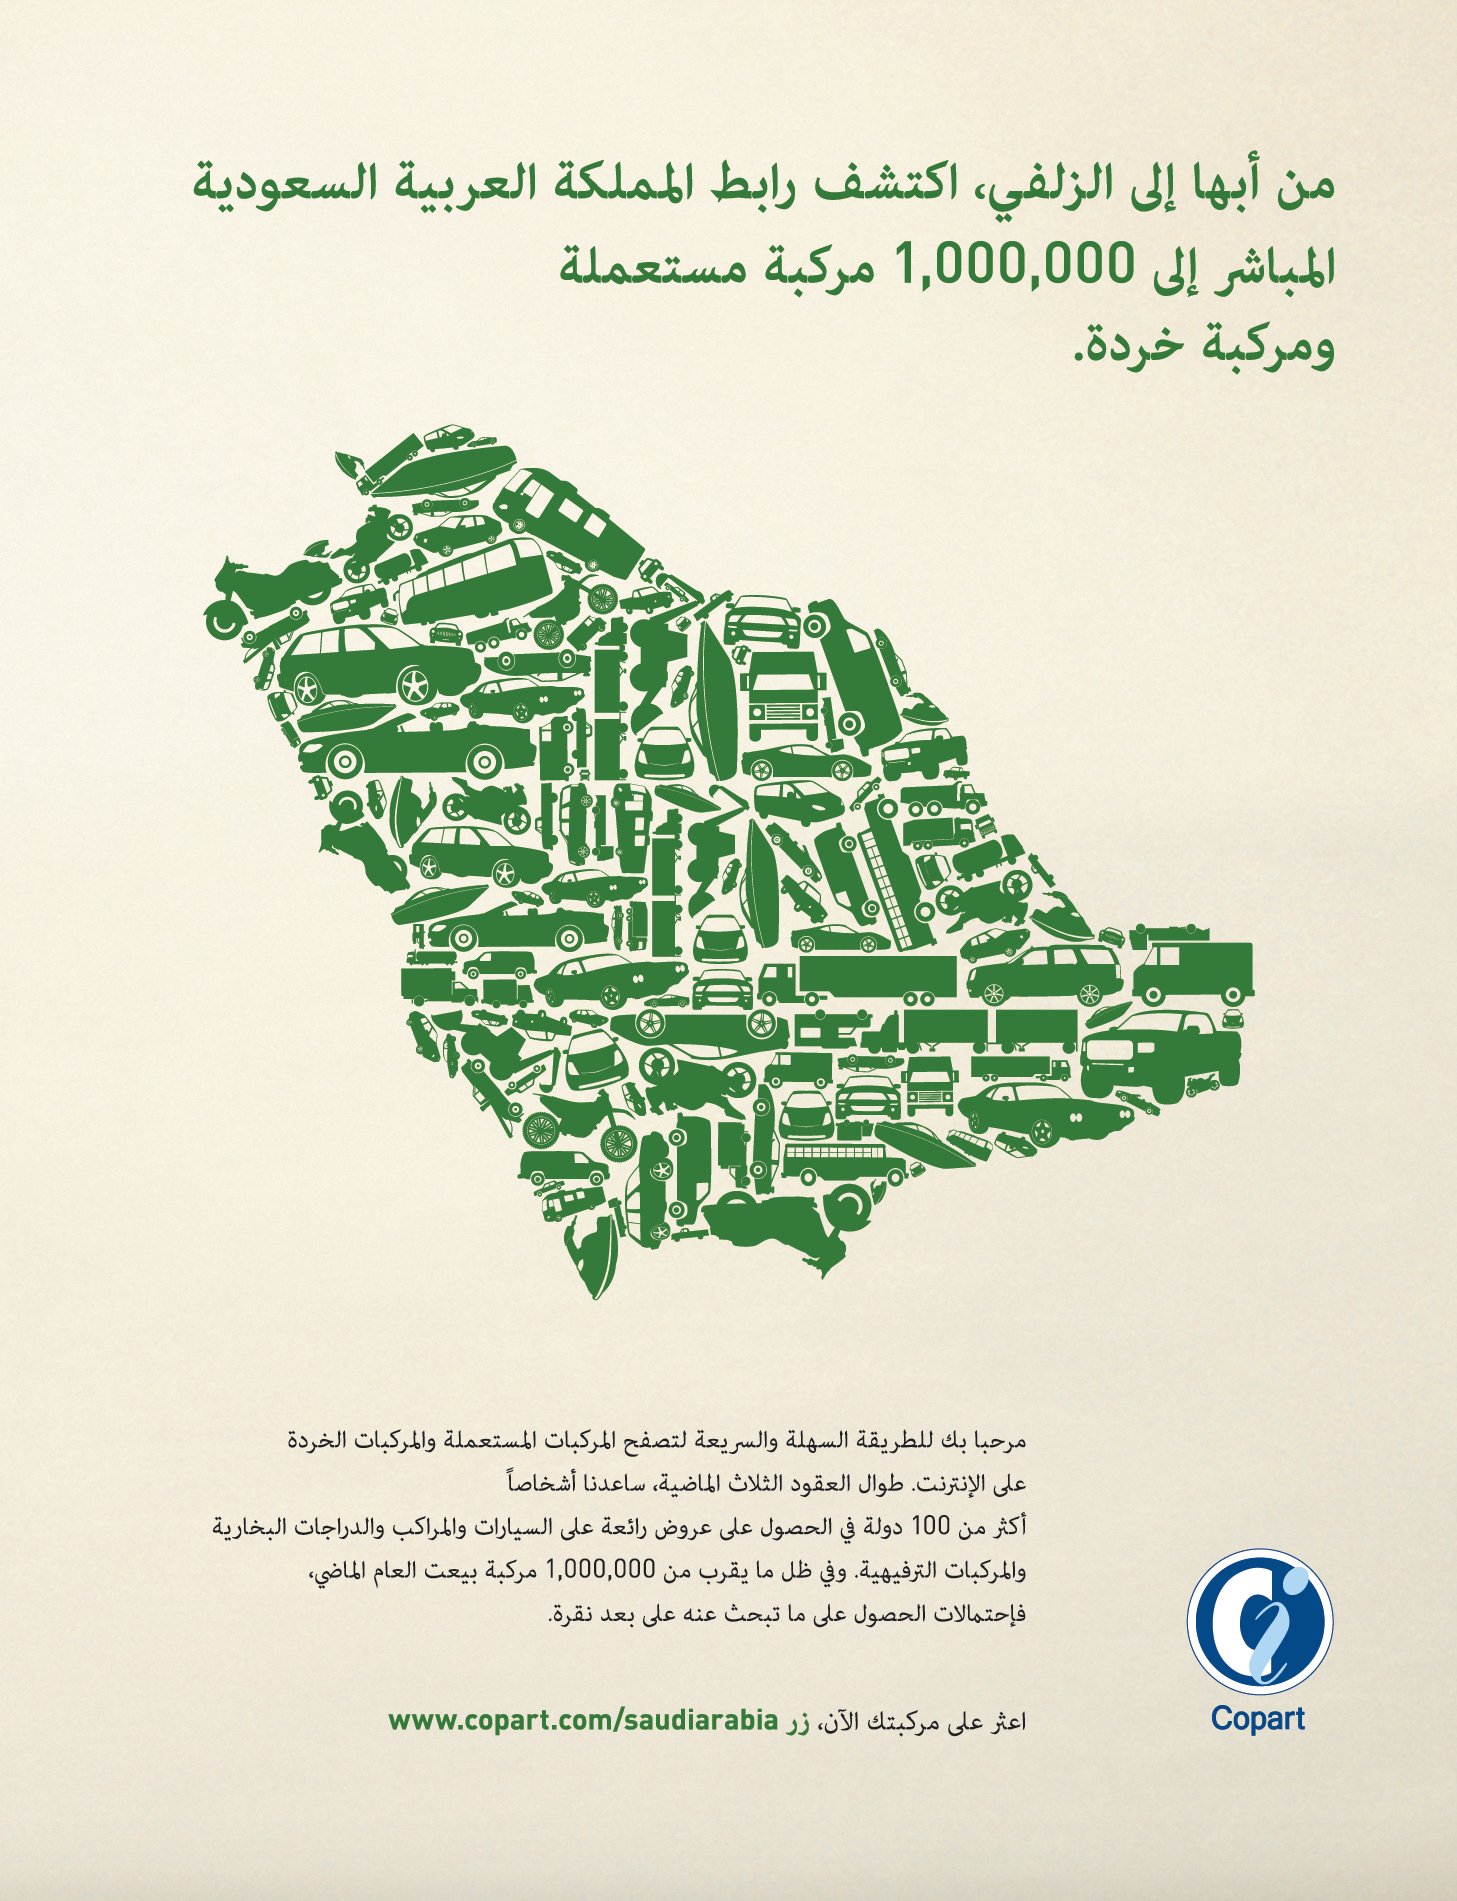 Language: Arabic